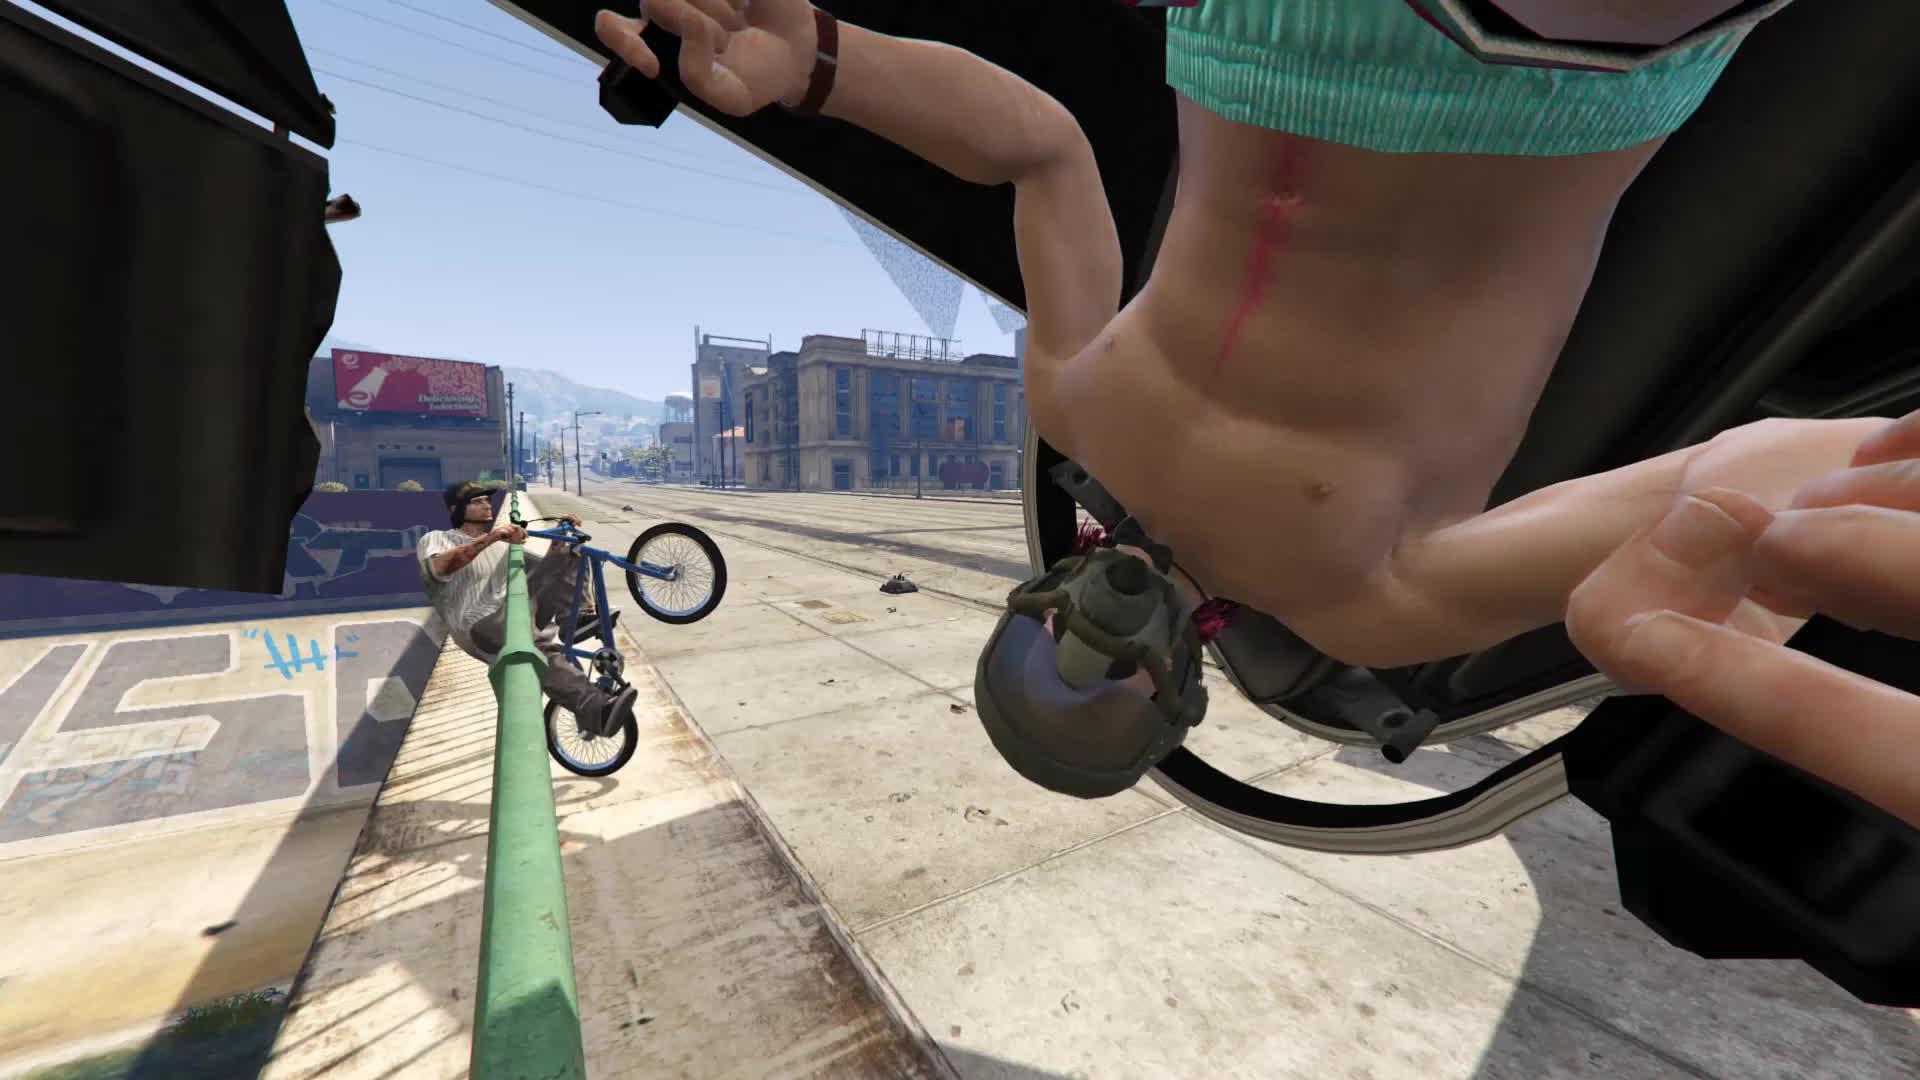 GamePhysics, gamephysics, Bike Thief GIFs